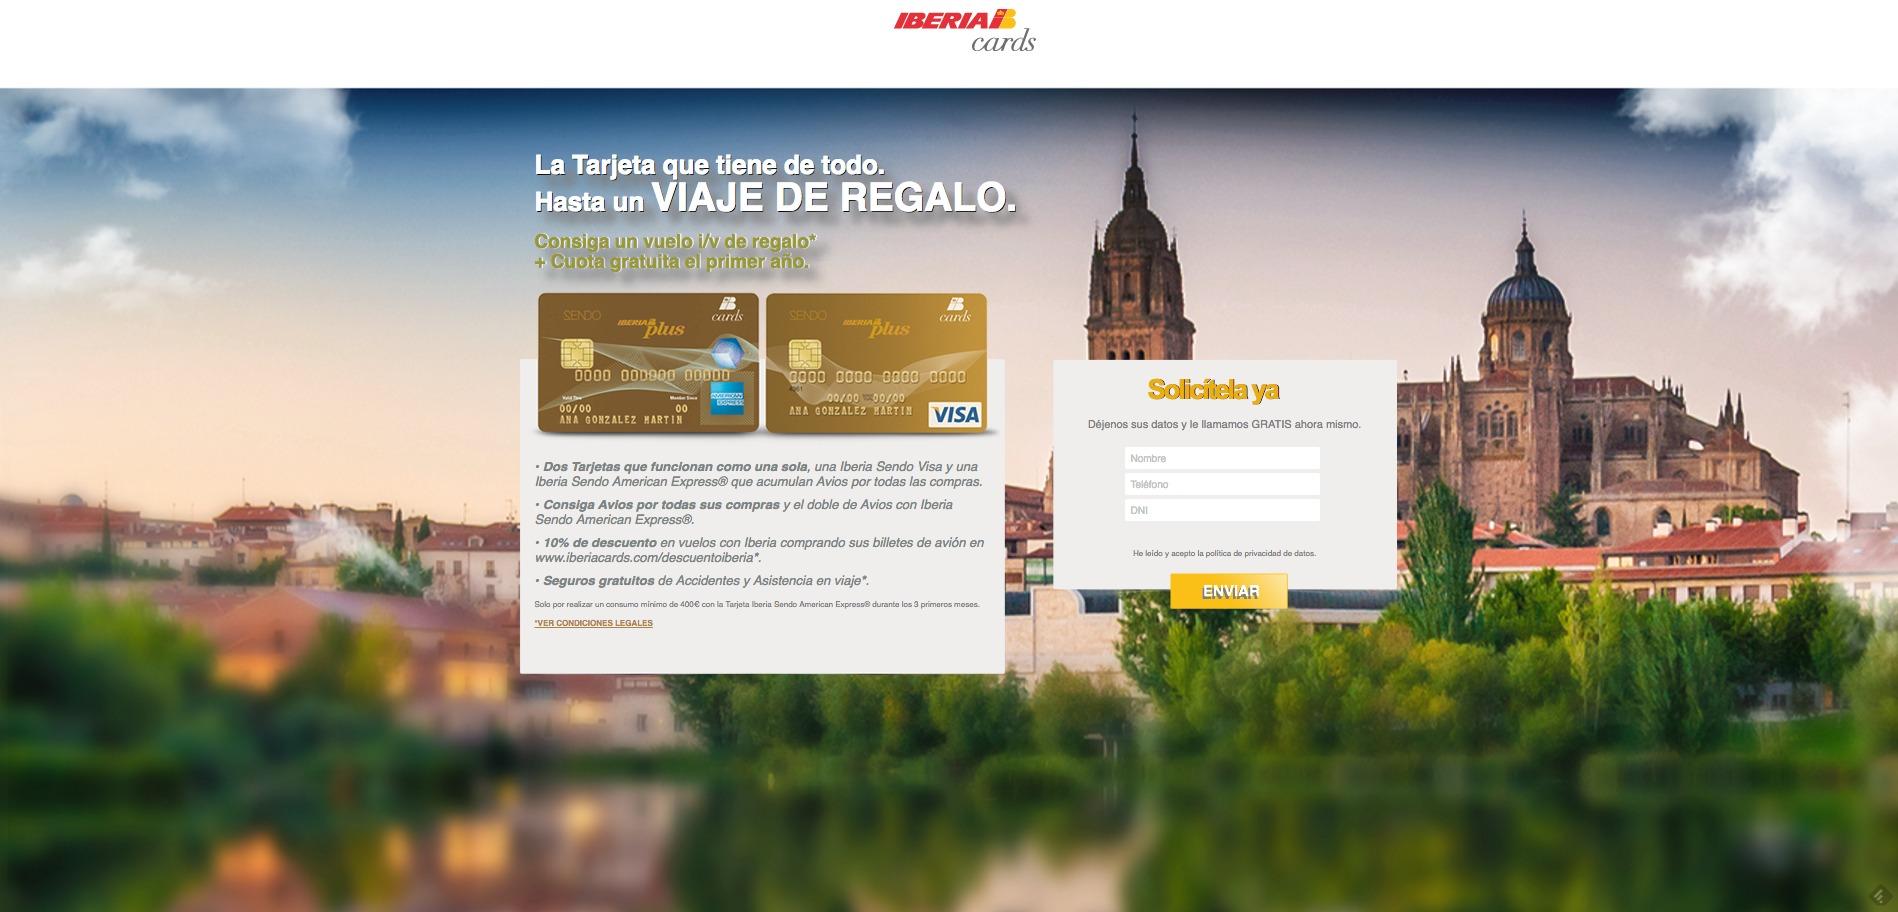 Solicitar tarjeta Iberia Cards